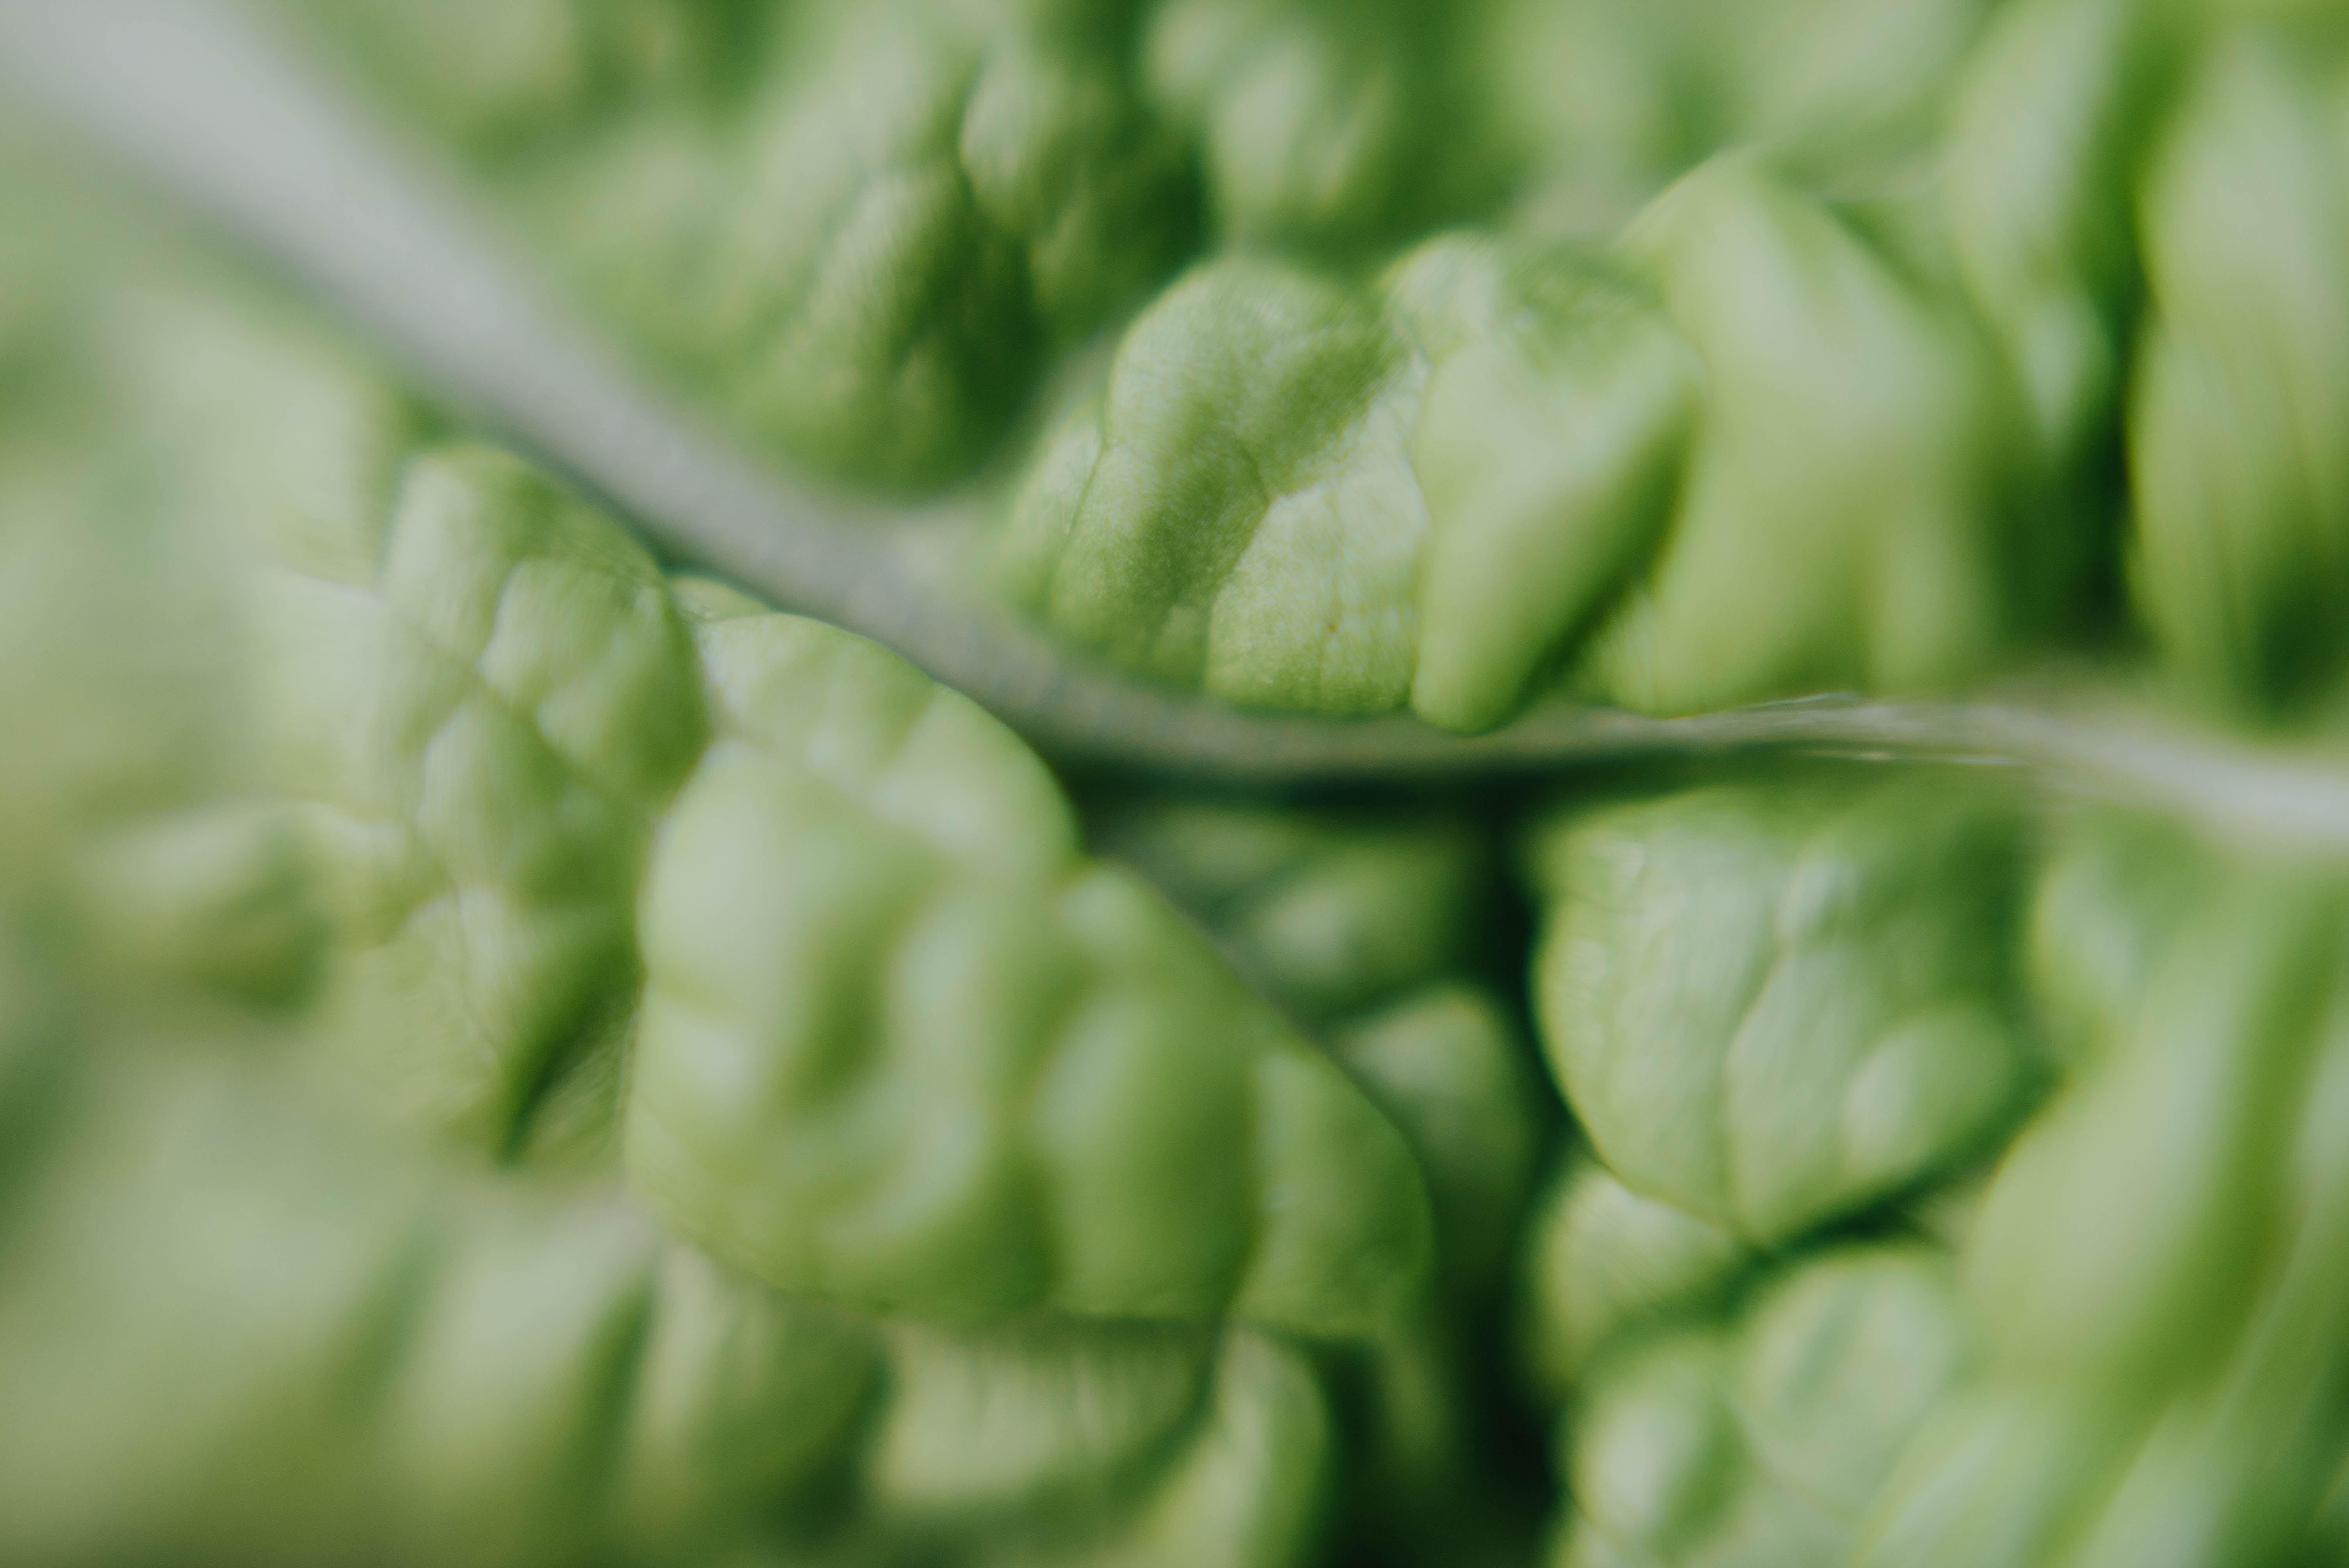 macro photography of green plant